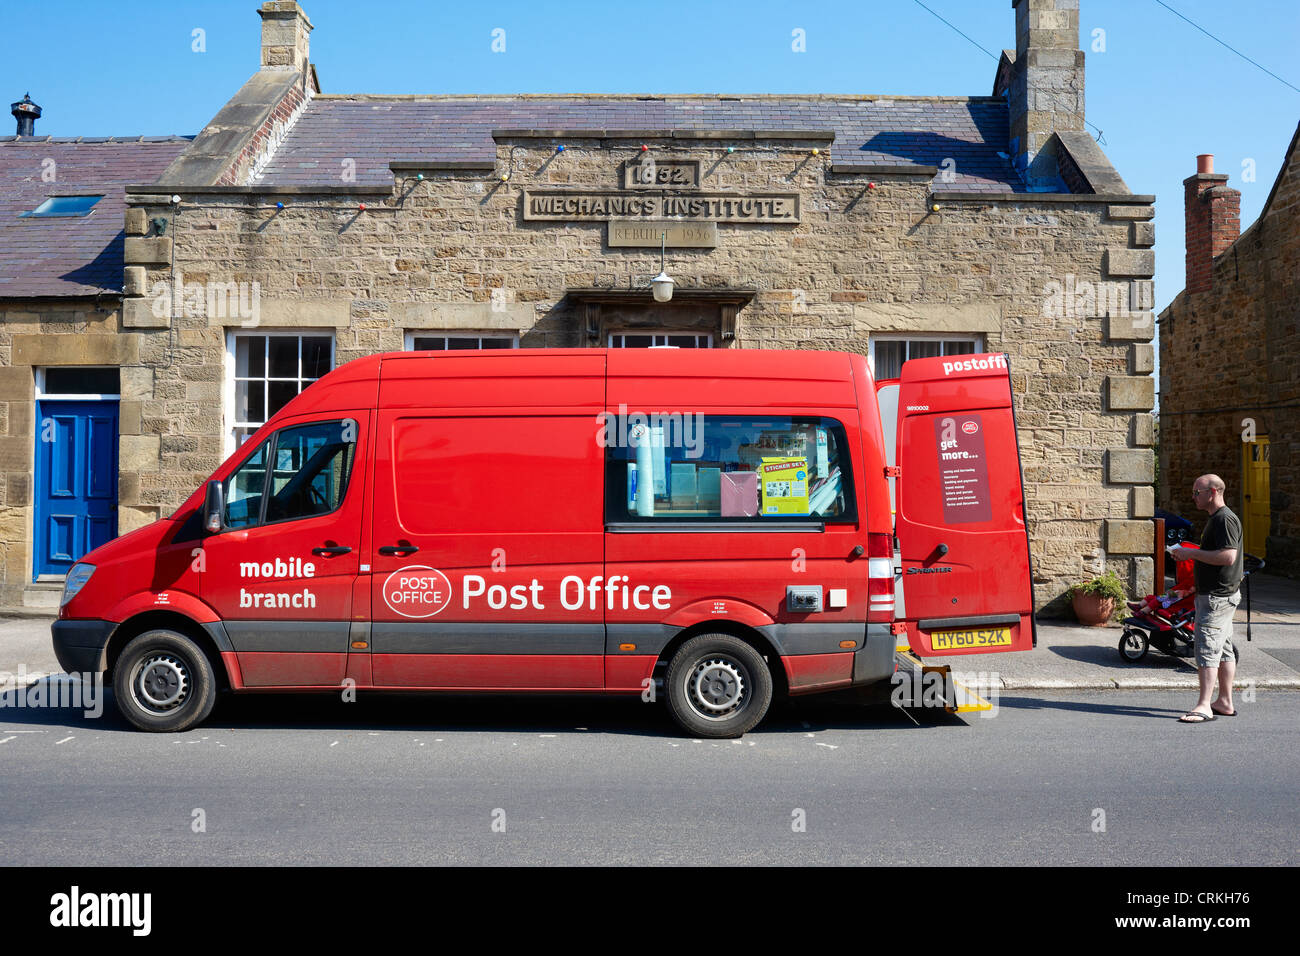 Mobile Post Office van visits the rural village of Kirkby Malzeard in North Yorkshire UK - Stock Image